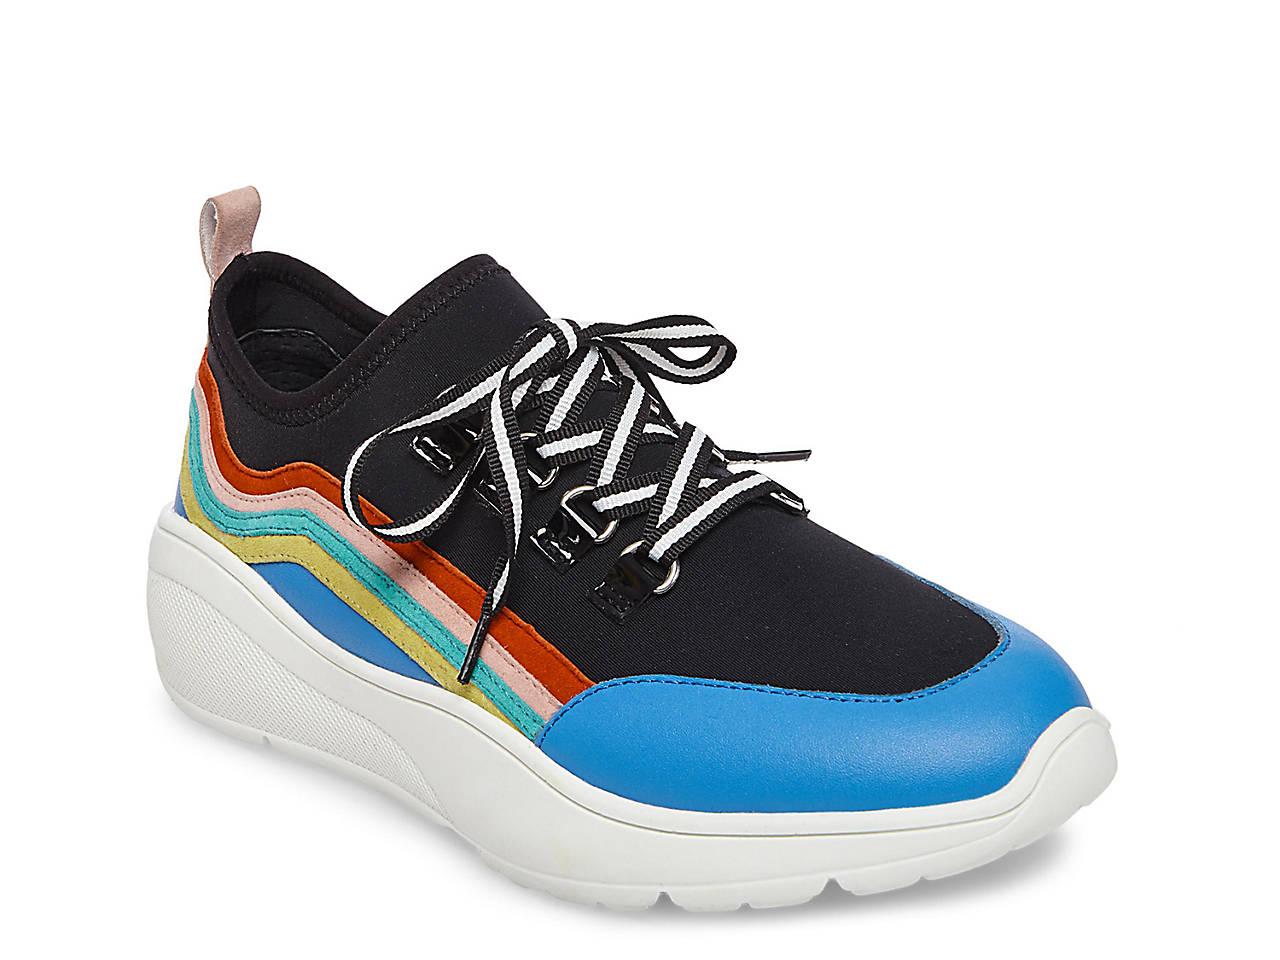 70dfa60b8de Steve Madden Cavo Sneaker Men s Shoes